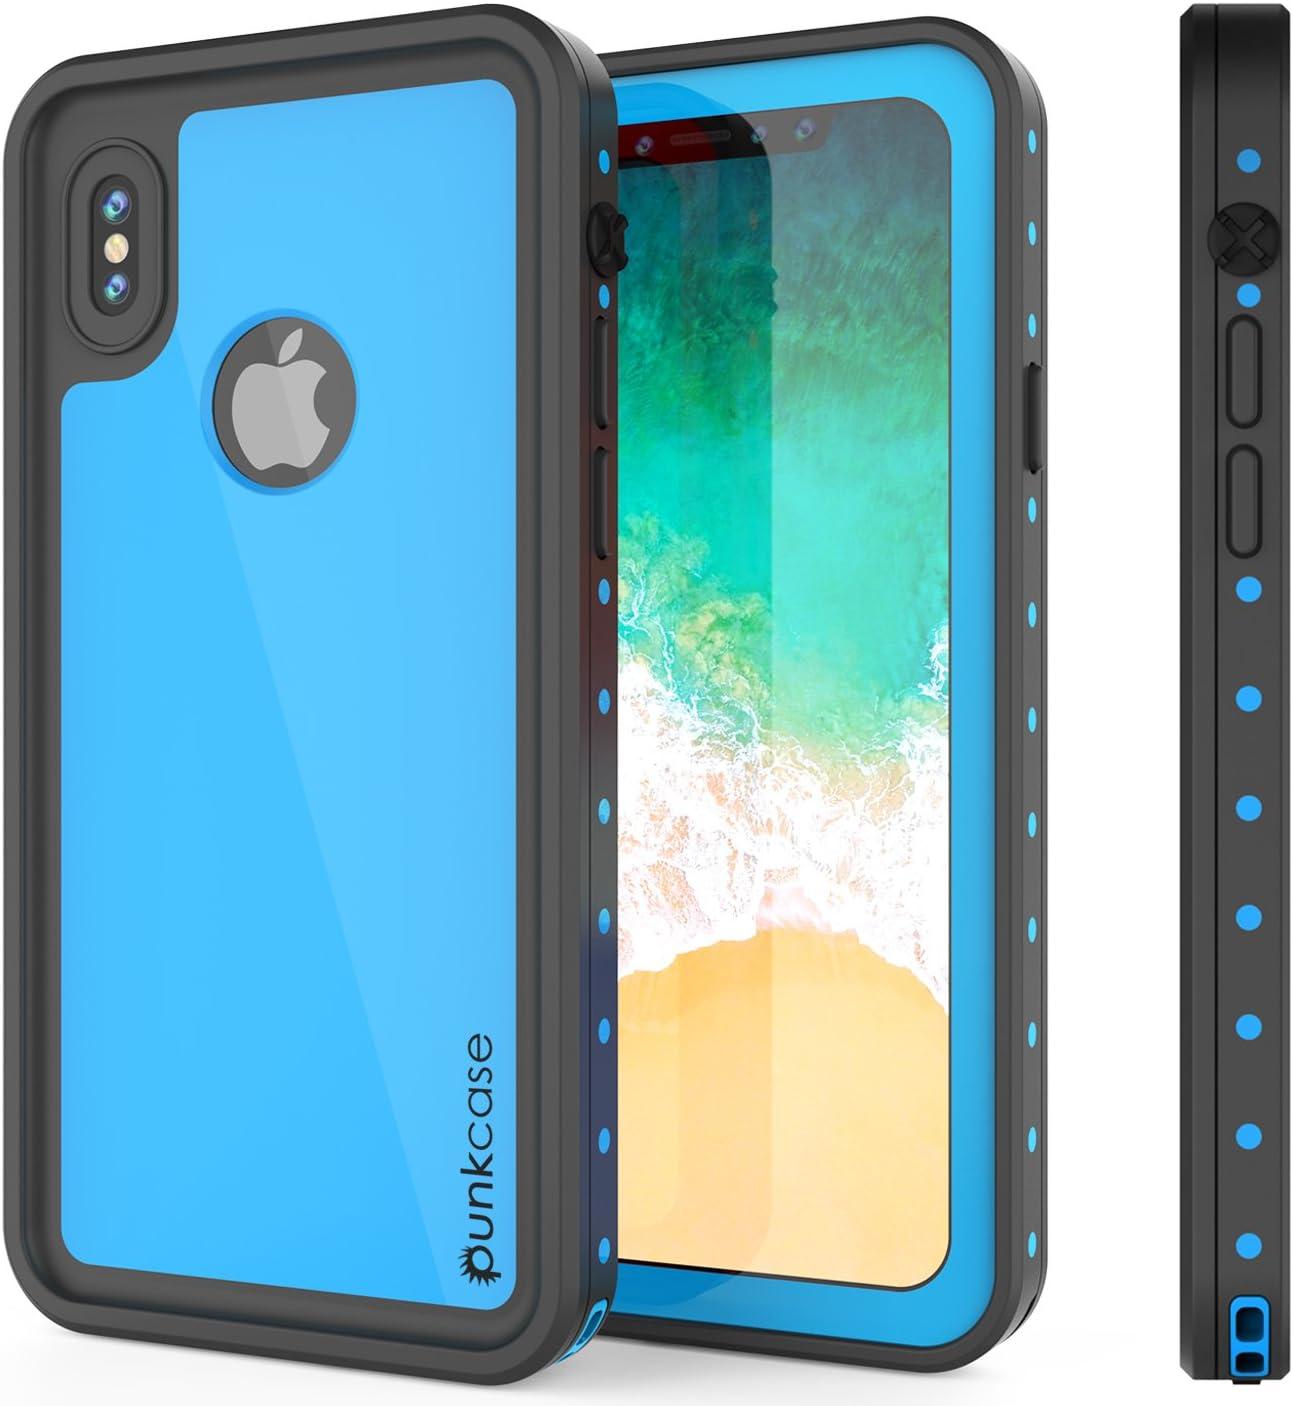 iPhone X Waterproof Case, Punkcase [StudStar Series] [Slim Fit] [IP68 Certified] [Shockproof] [Dirtproof] [Snowproof] Armor Cover for Apple iPhone Ten [Light Blue]